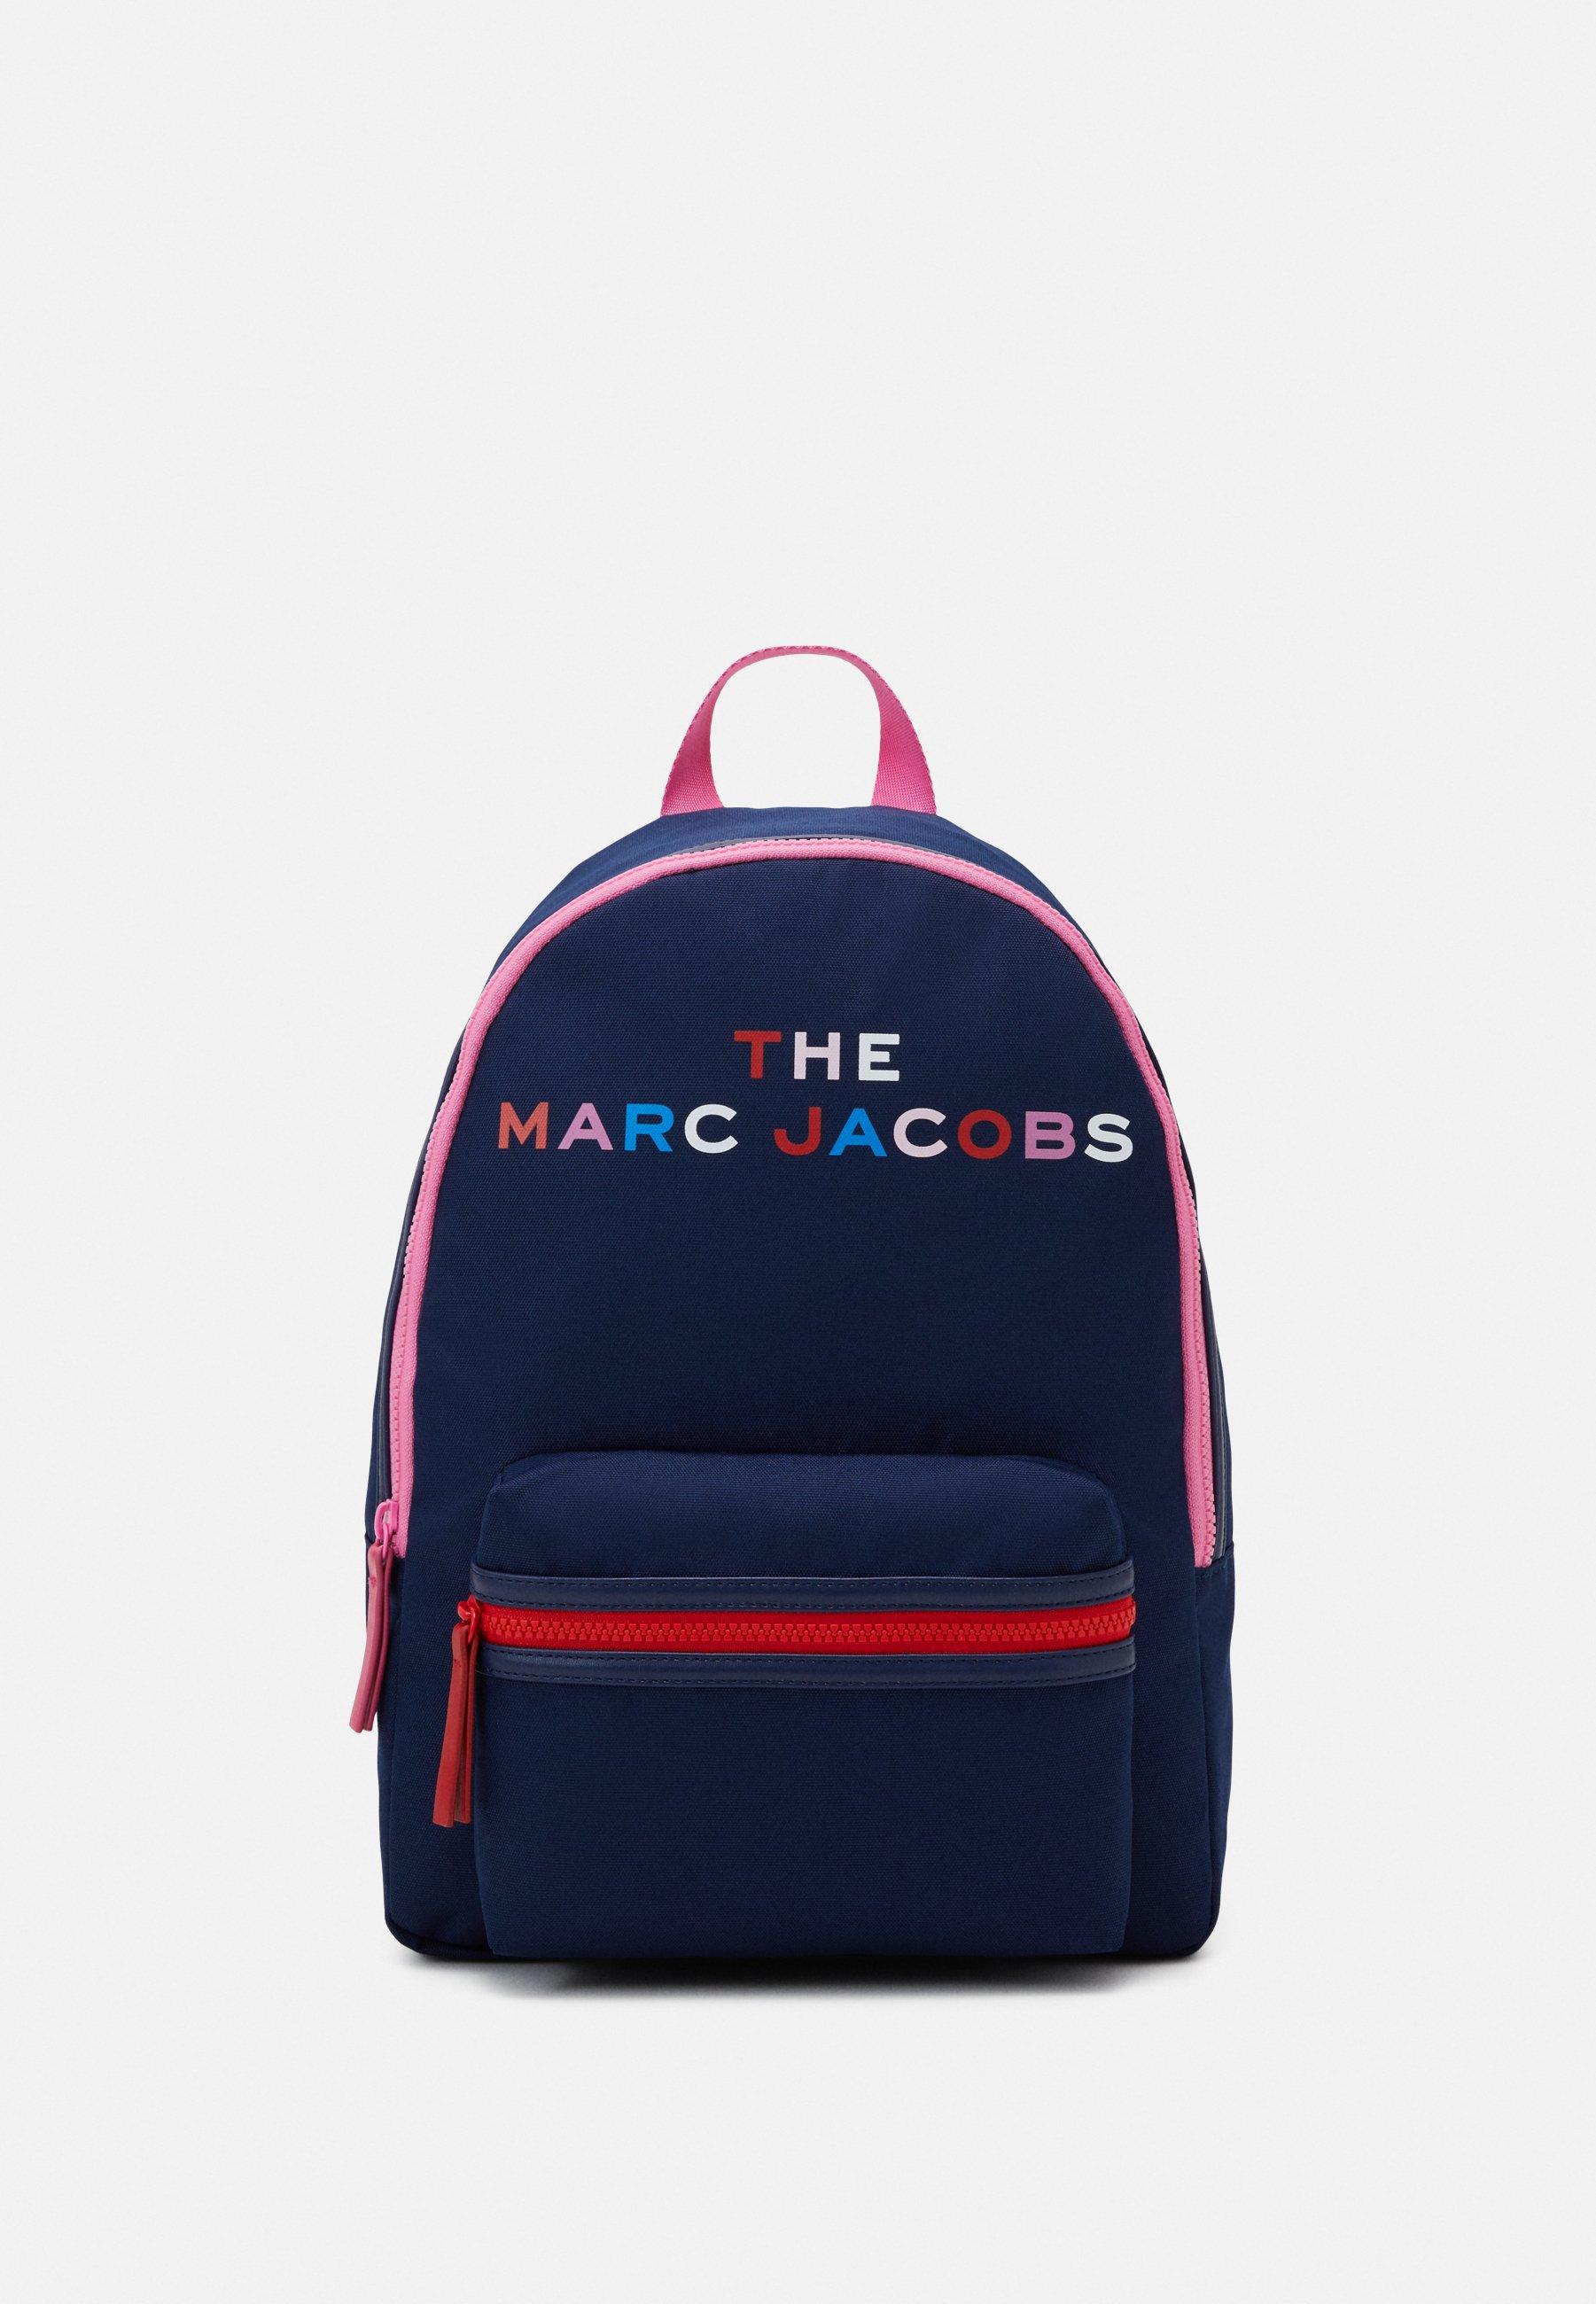 marc jacobs väska zalando